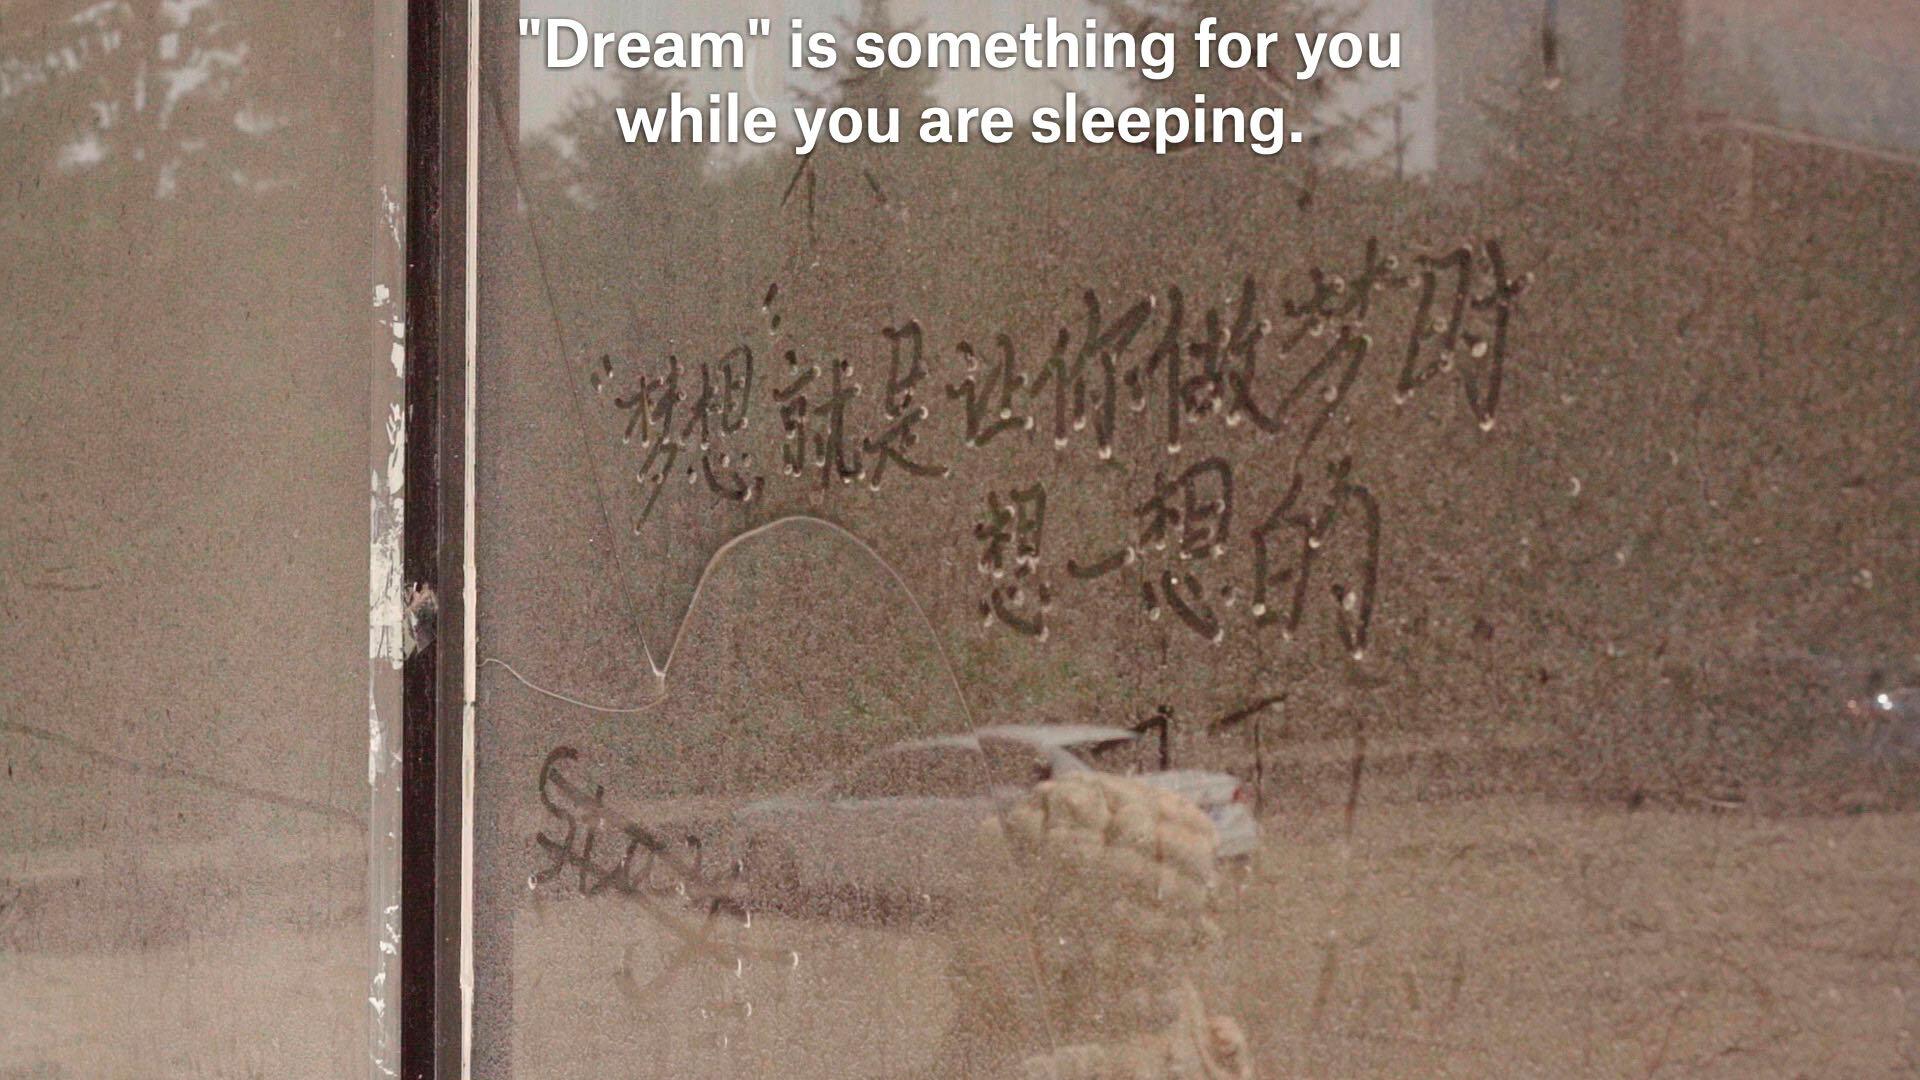 Zhang_Hanwen_SS00169510.jpg